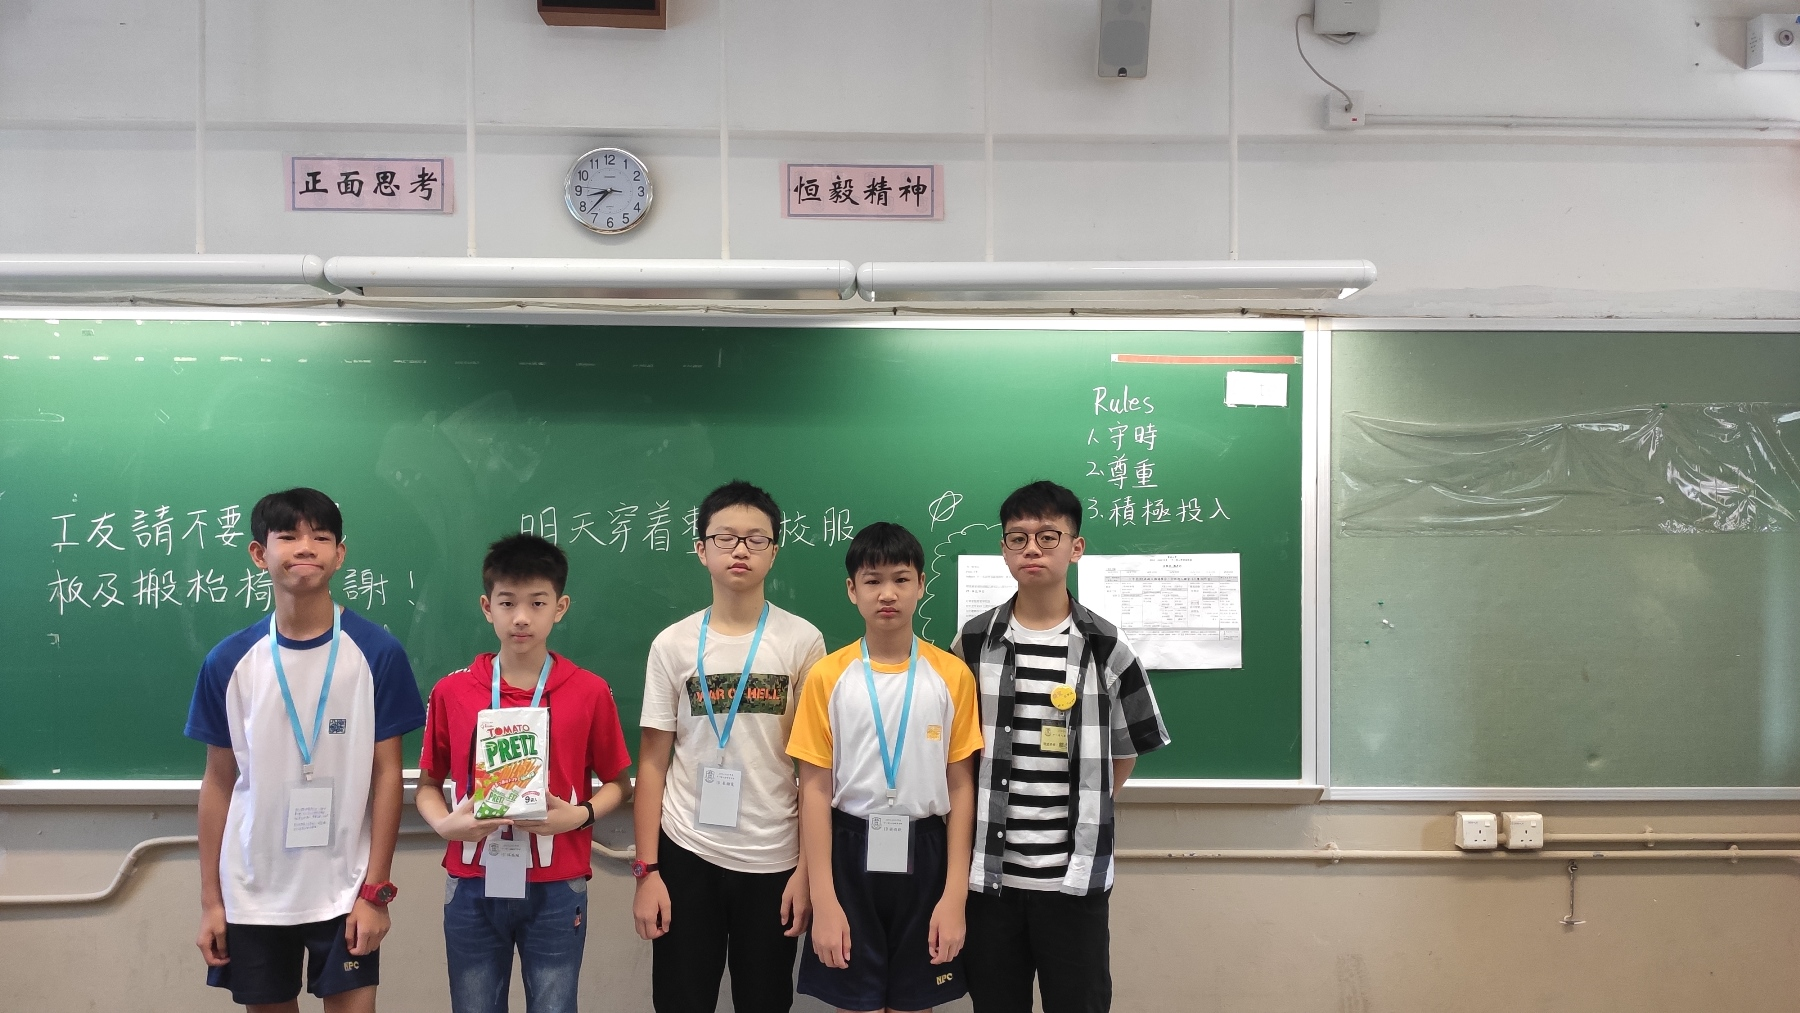 https://npc.edu.hk/sites/default/files/img_20190816_083801.jpg